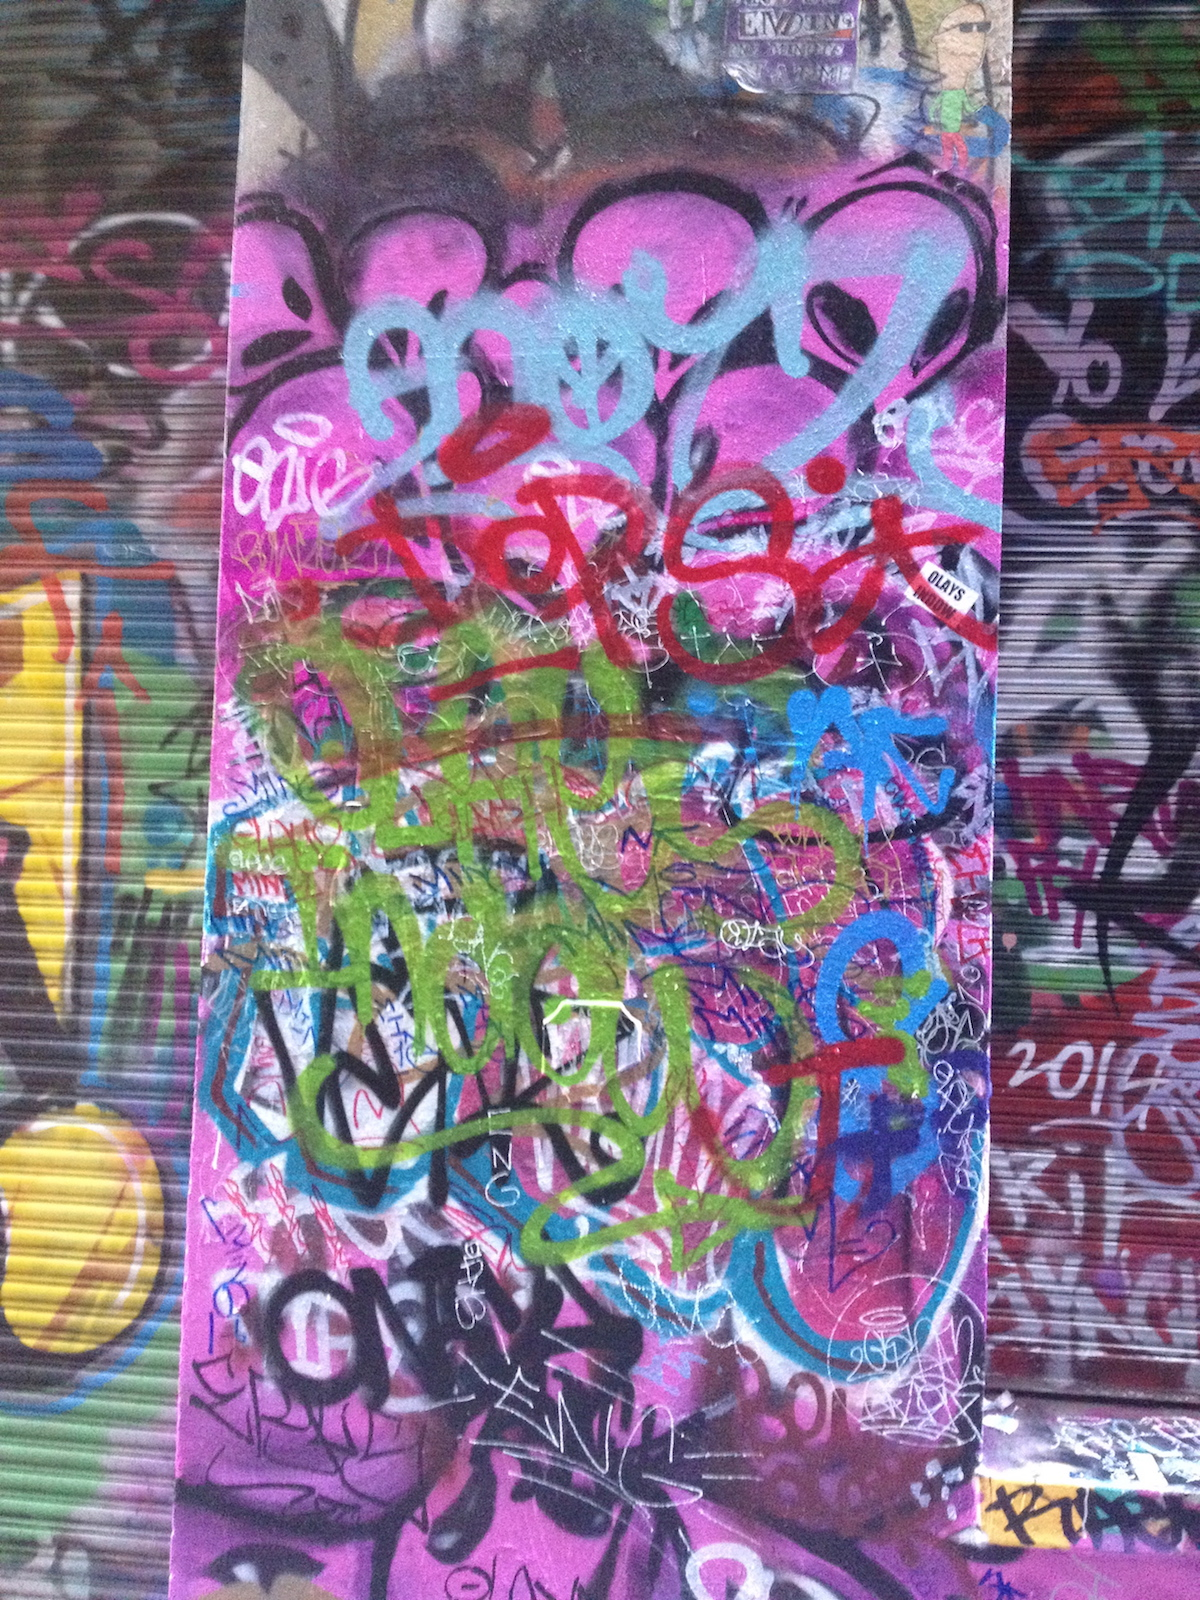 Graffiti lanes a Malebourne